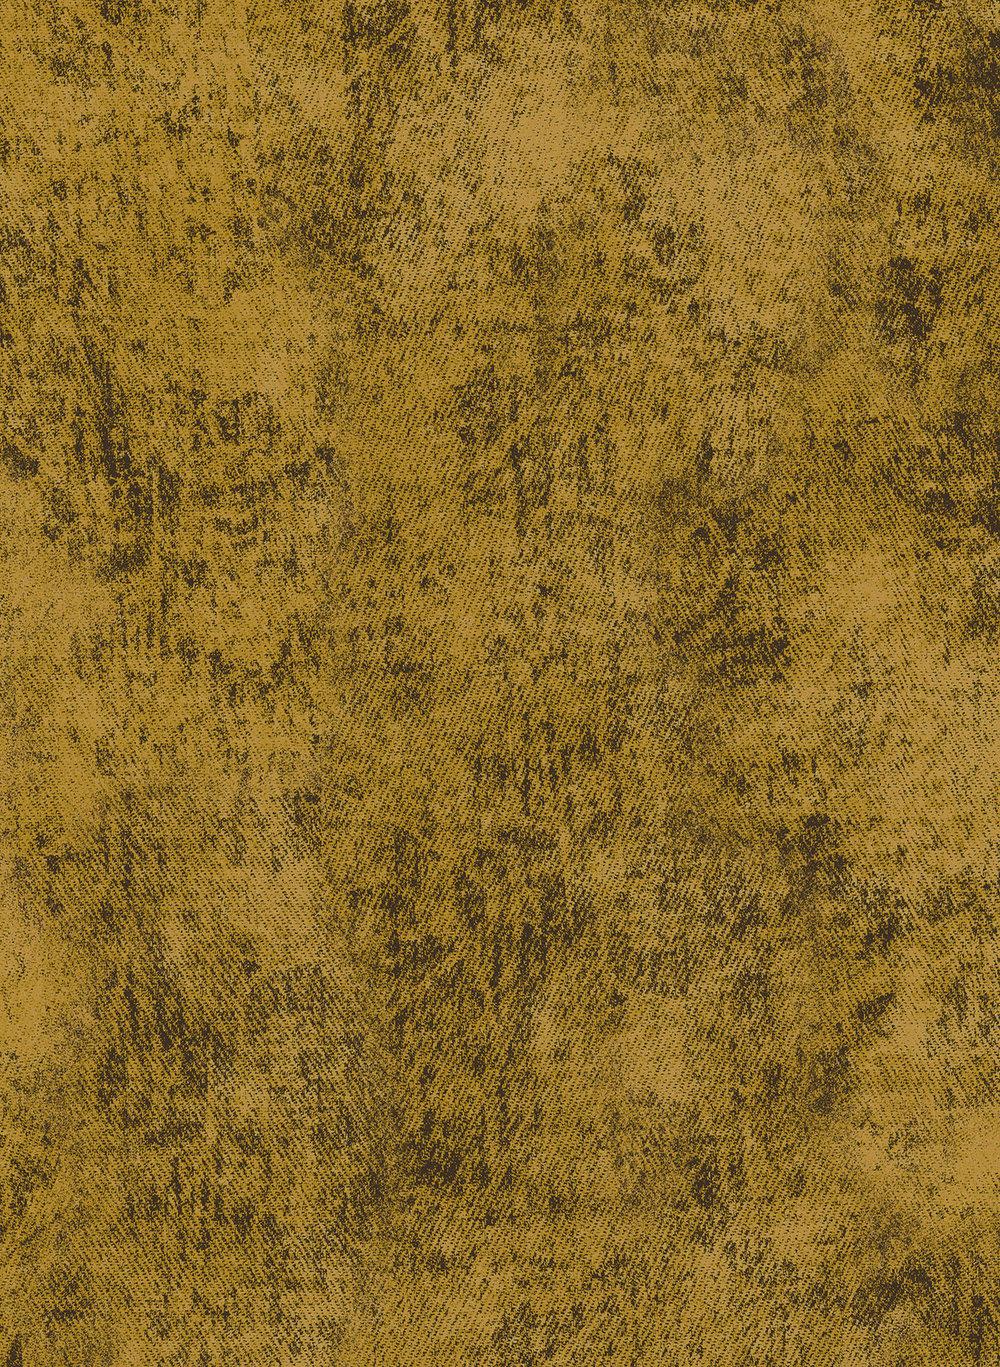 Denim -Gold - 3212-018